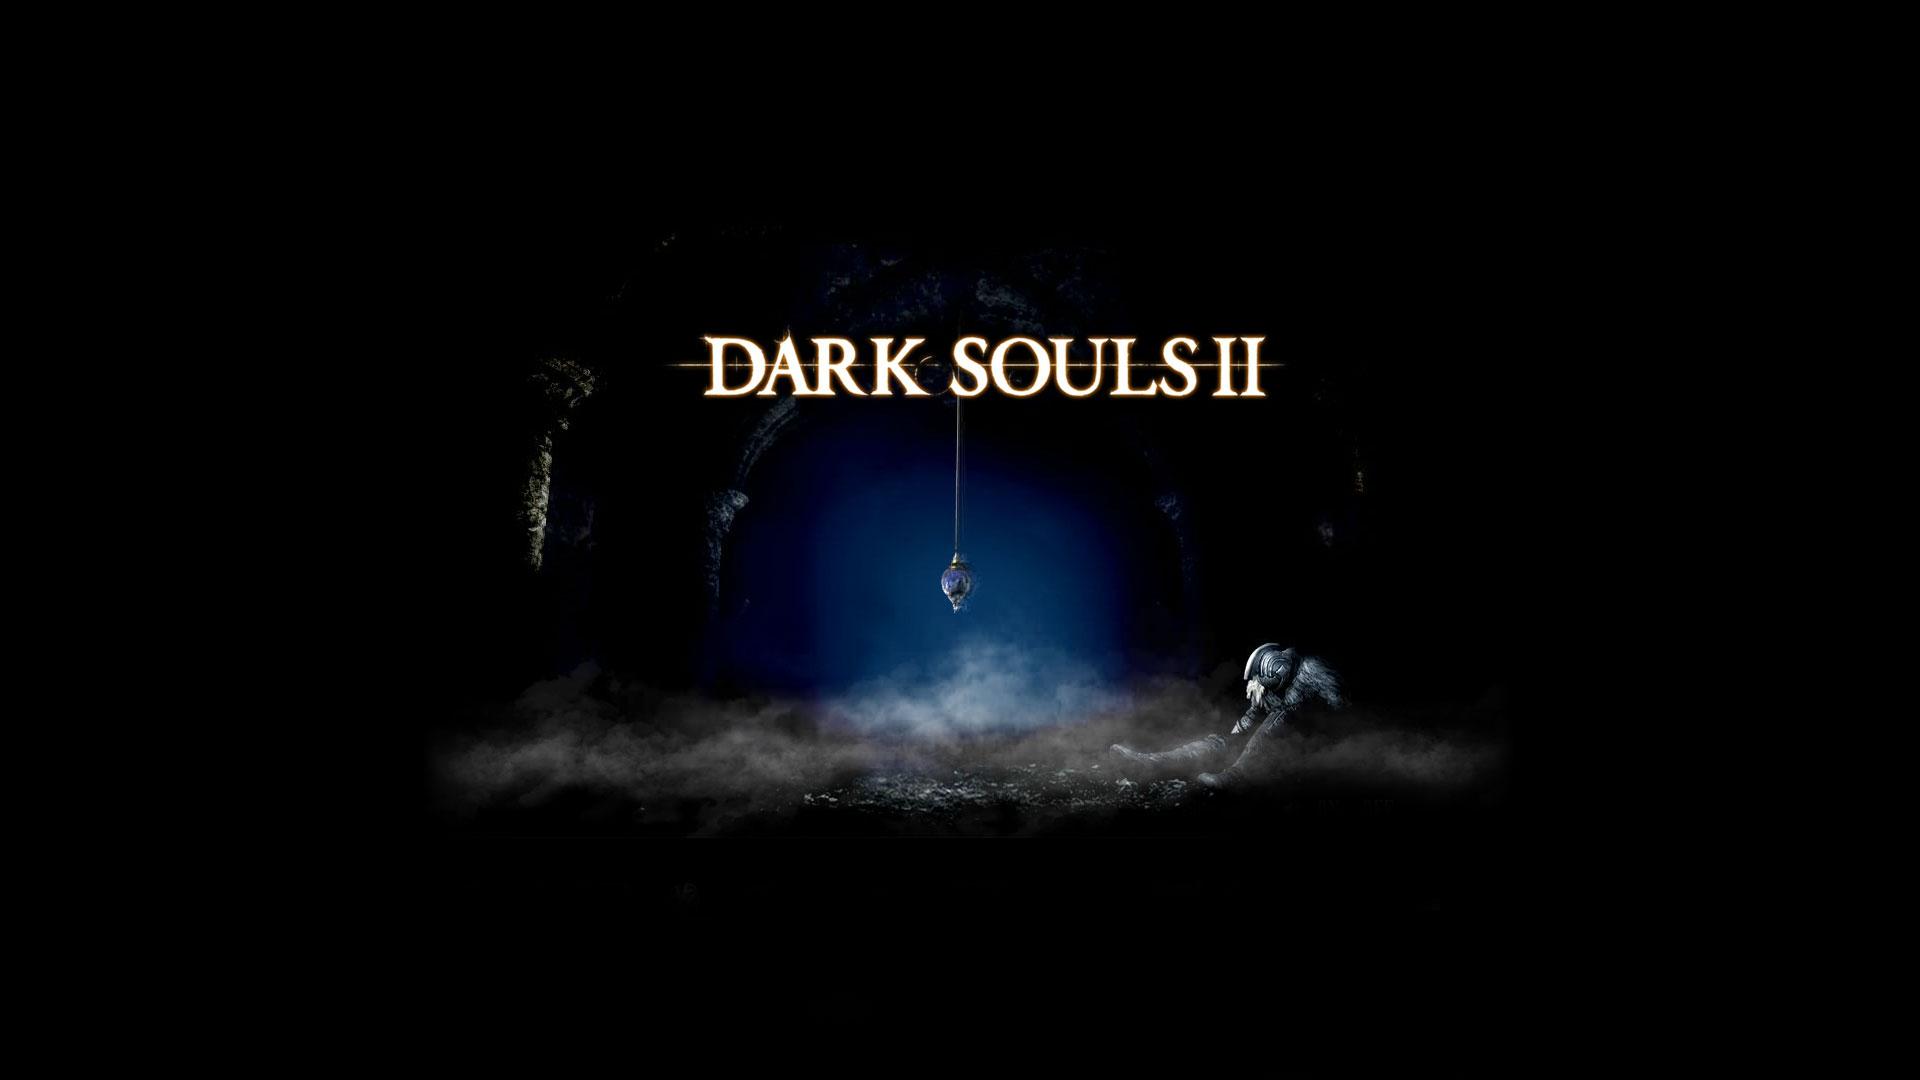 Dark Souls 2 Wallpaper 1080p Dark Souls 2 720p Wallpaper 1920x1080